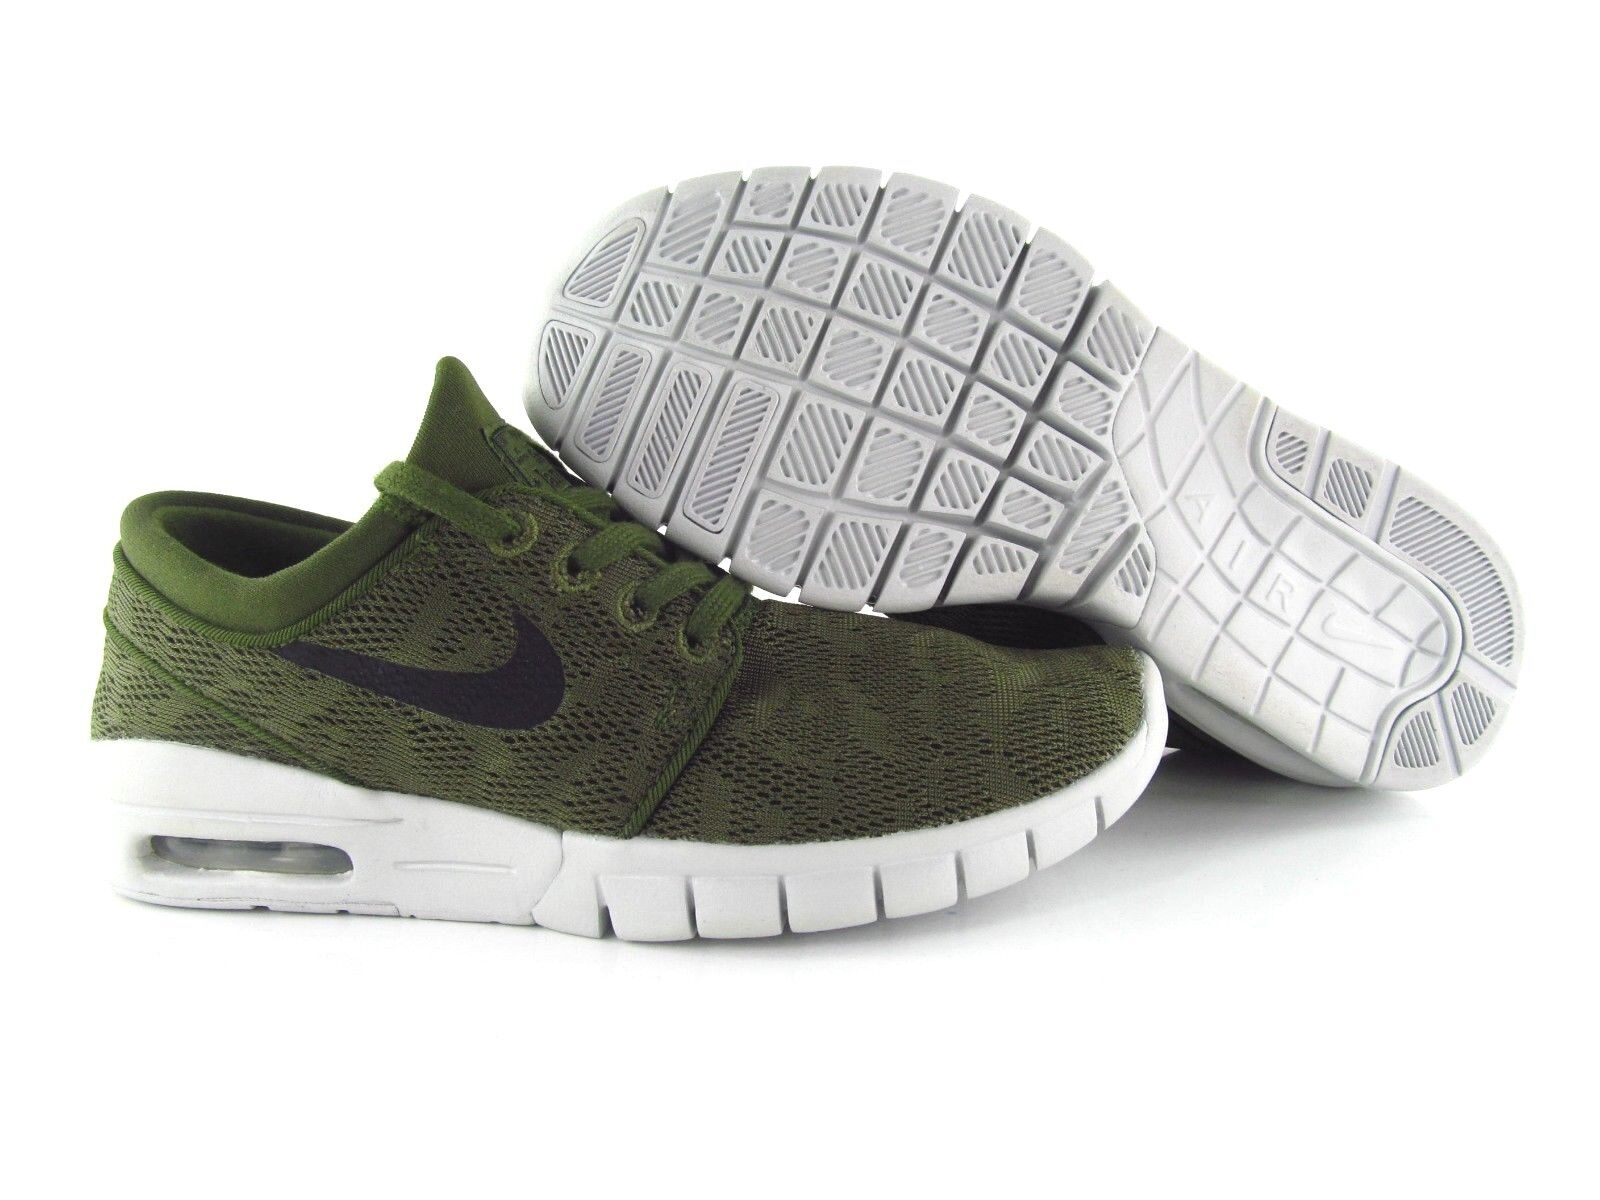 Nike SB Stefan Janoski Max Army Green UK_4 US_4.5 Eur 36.5